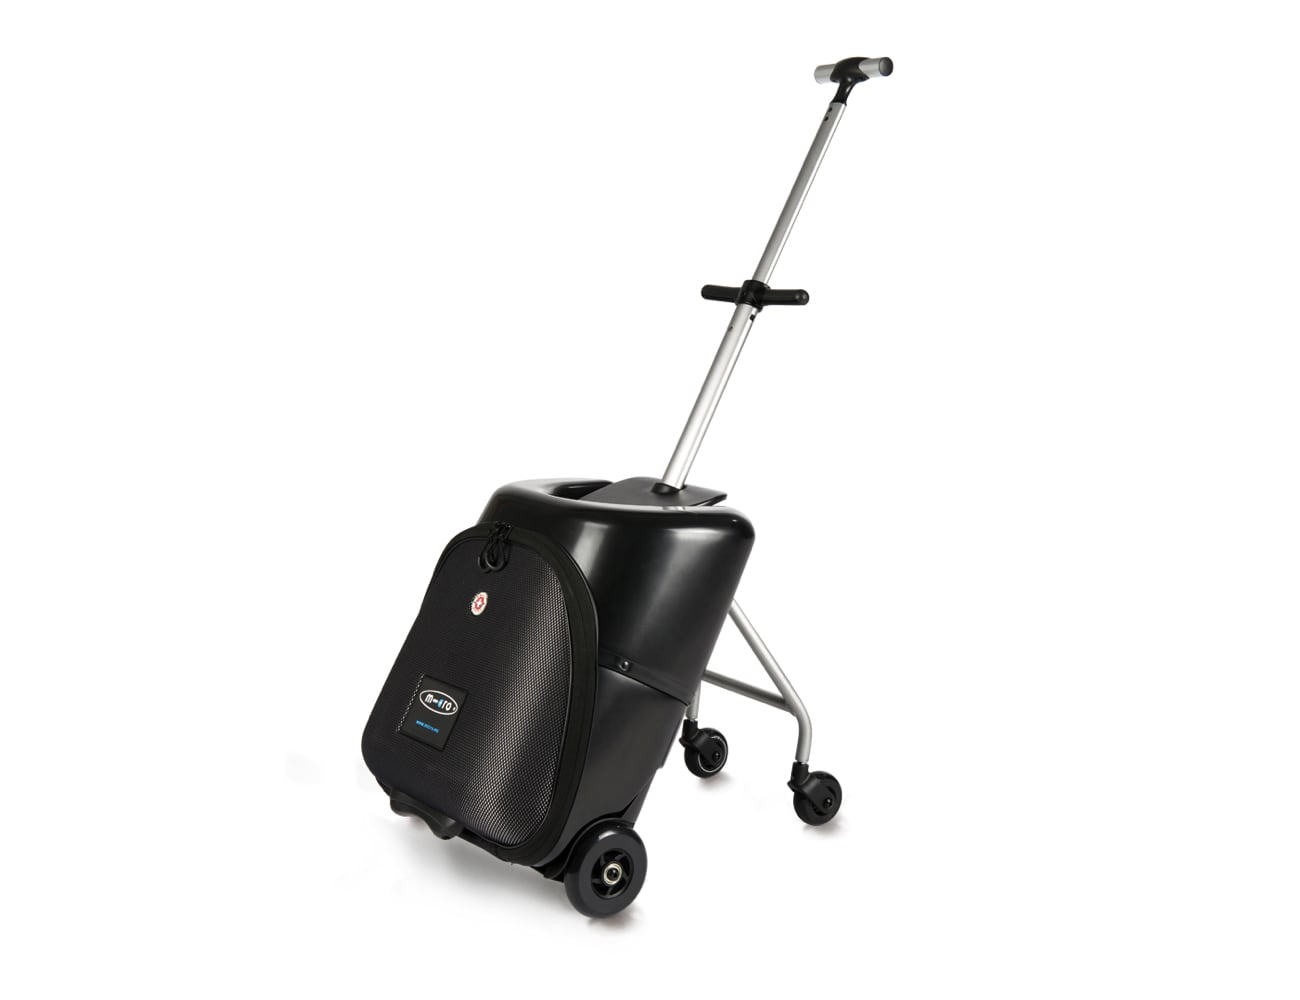 Micro Lazy Luggage Smart Travel Companion